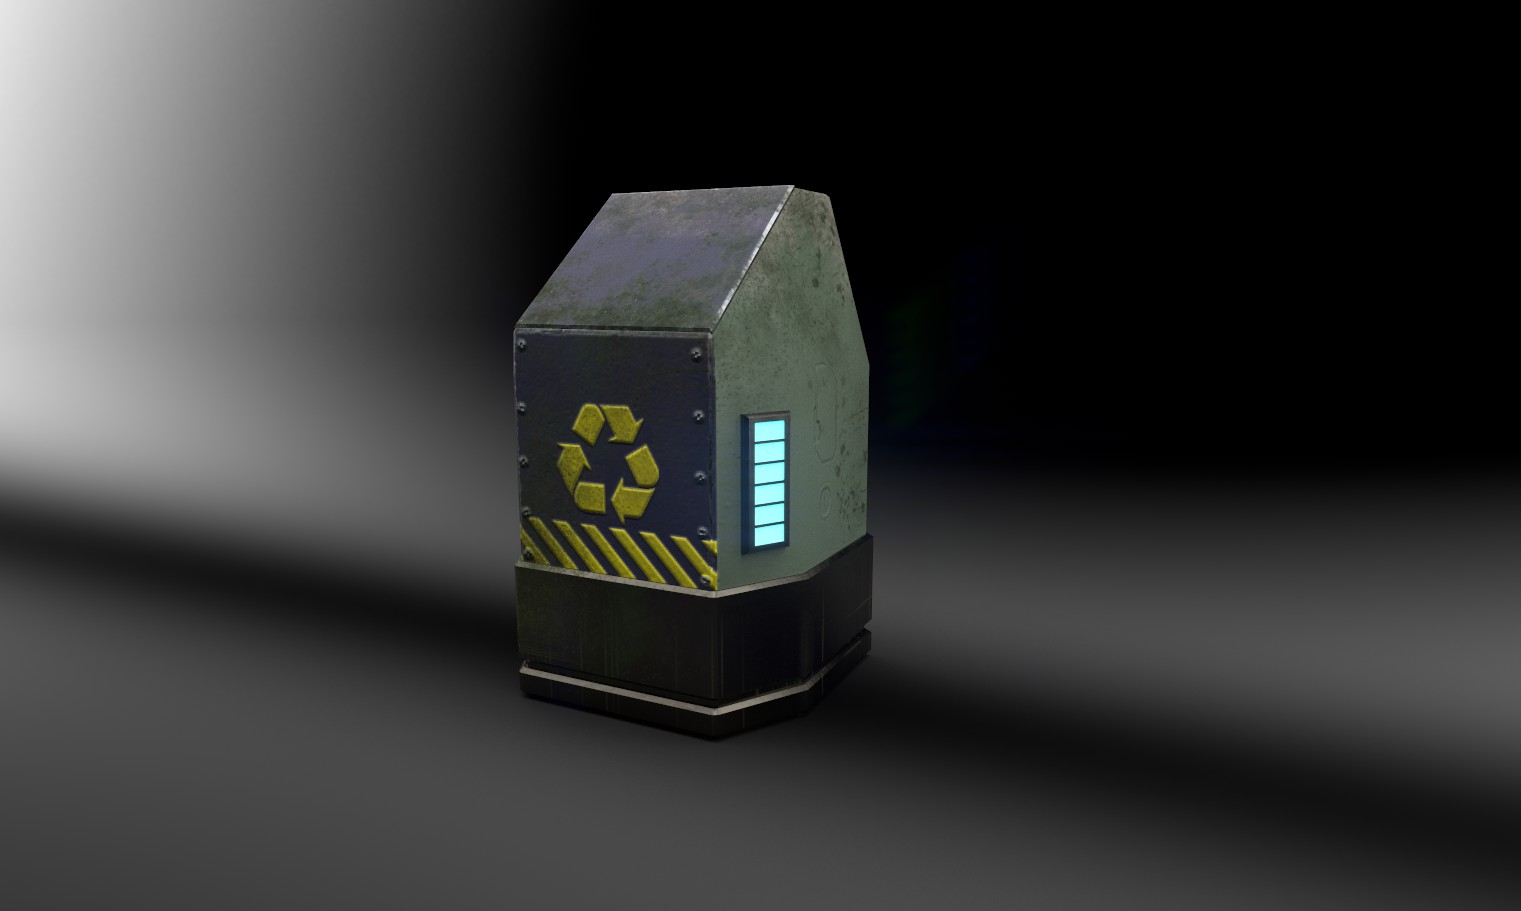 3d model of metal futuristic trash can